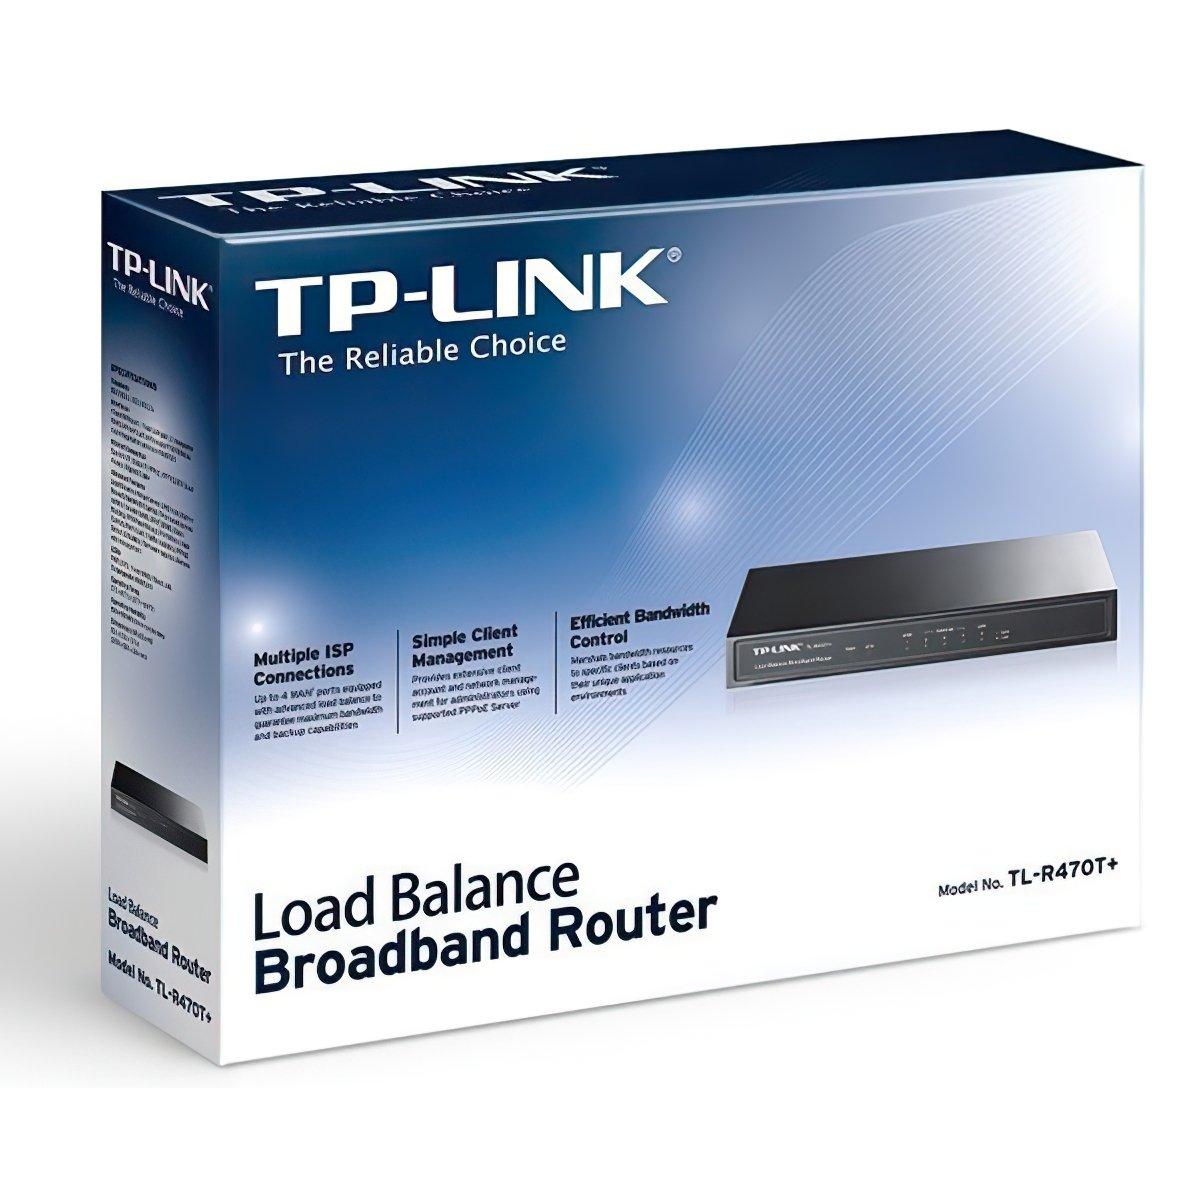 Маршрутизатор TP-Link TL-R470T+ 3xLAN/WAN, 1xWAN (TL-R470T+) фото